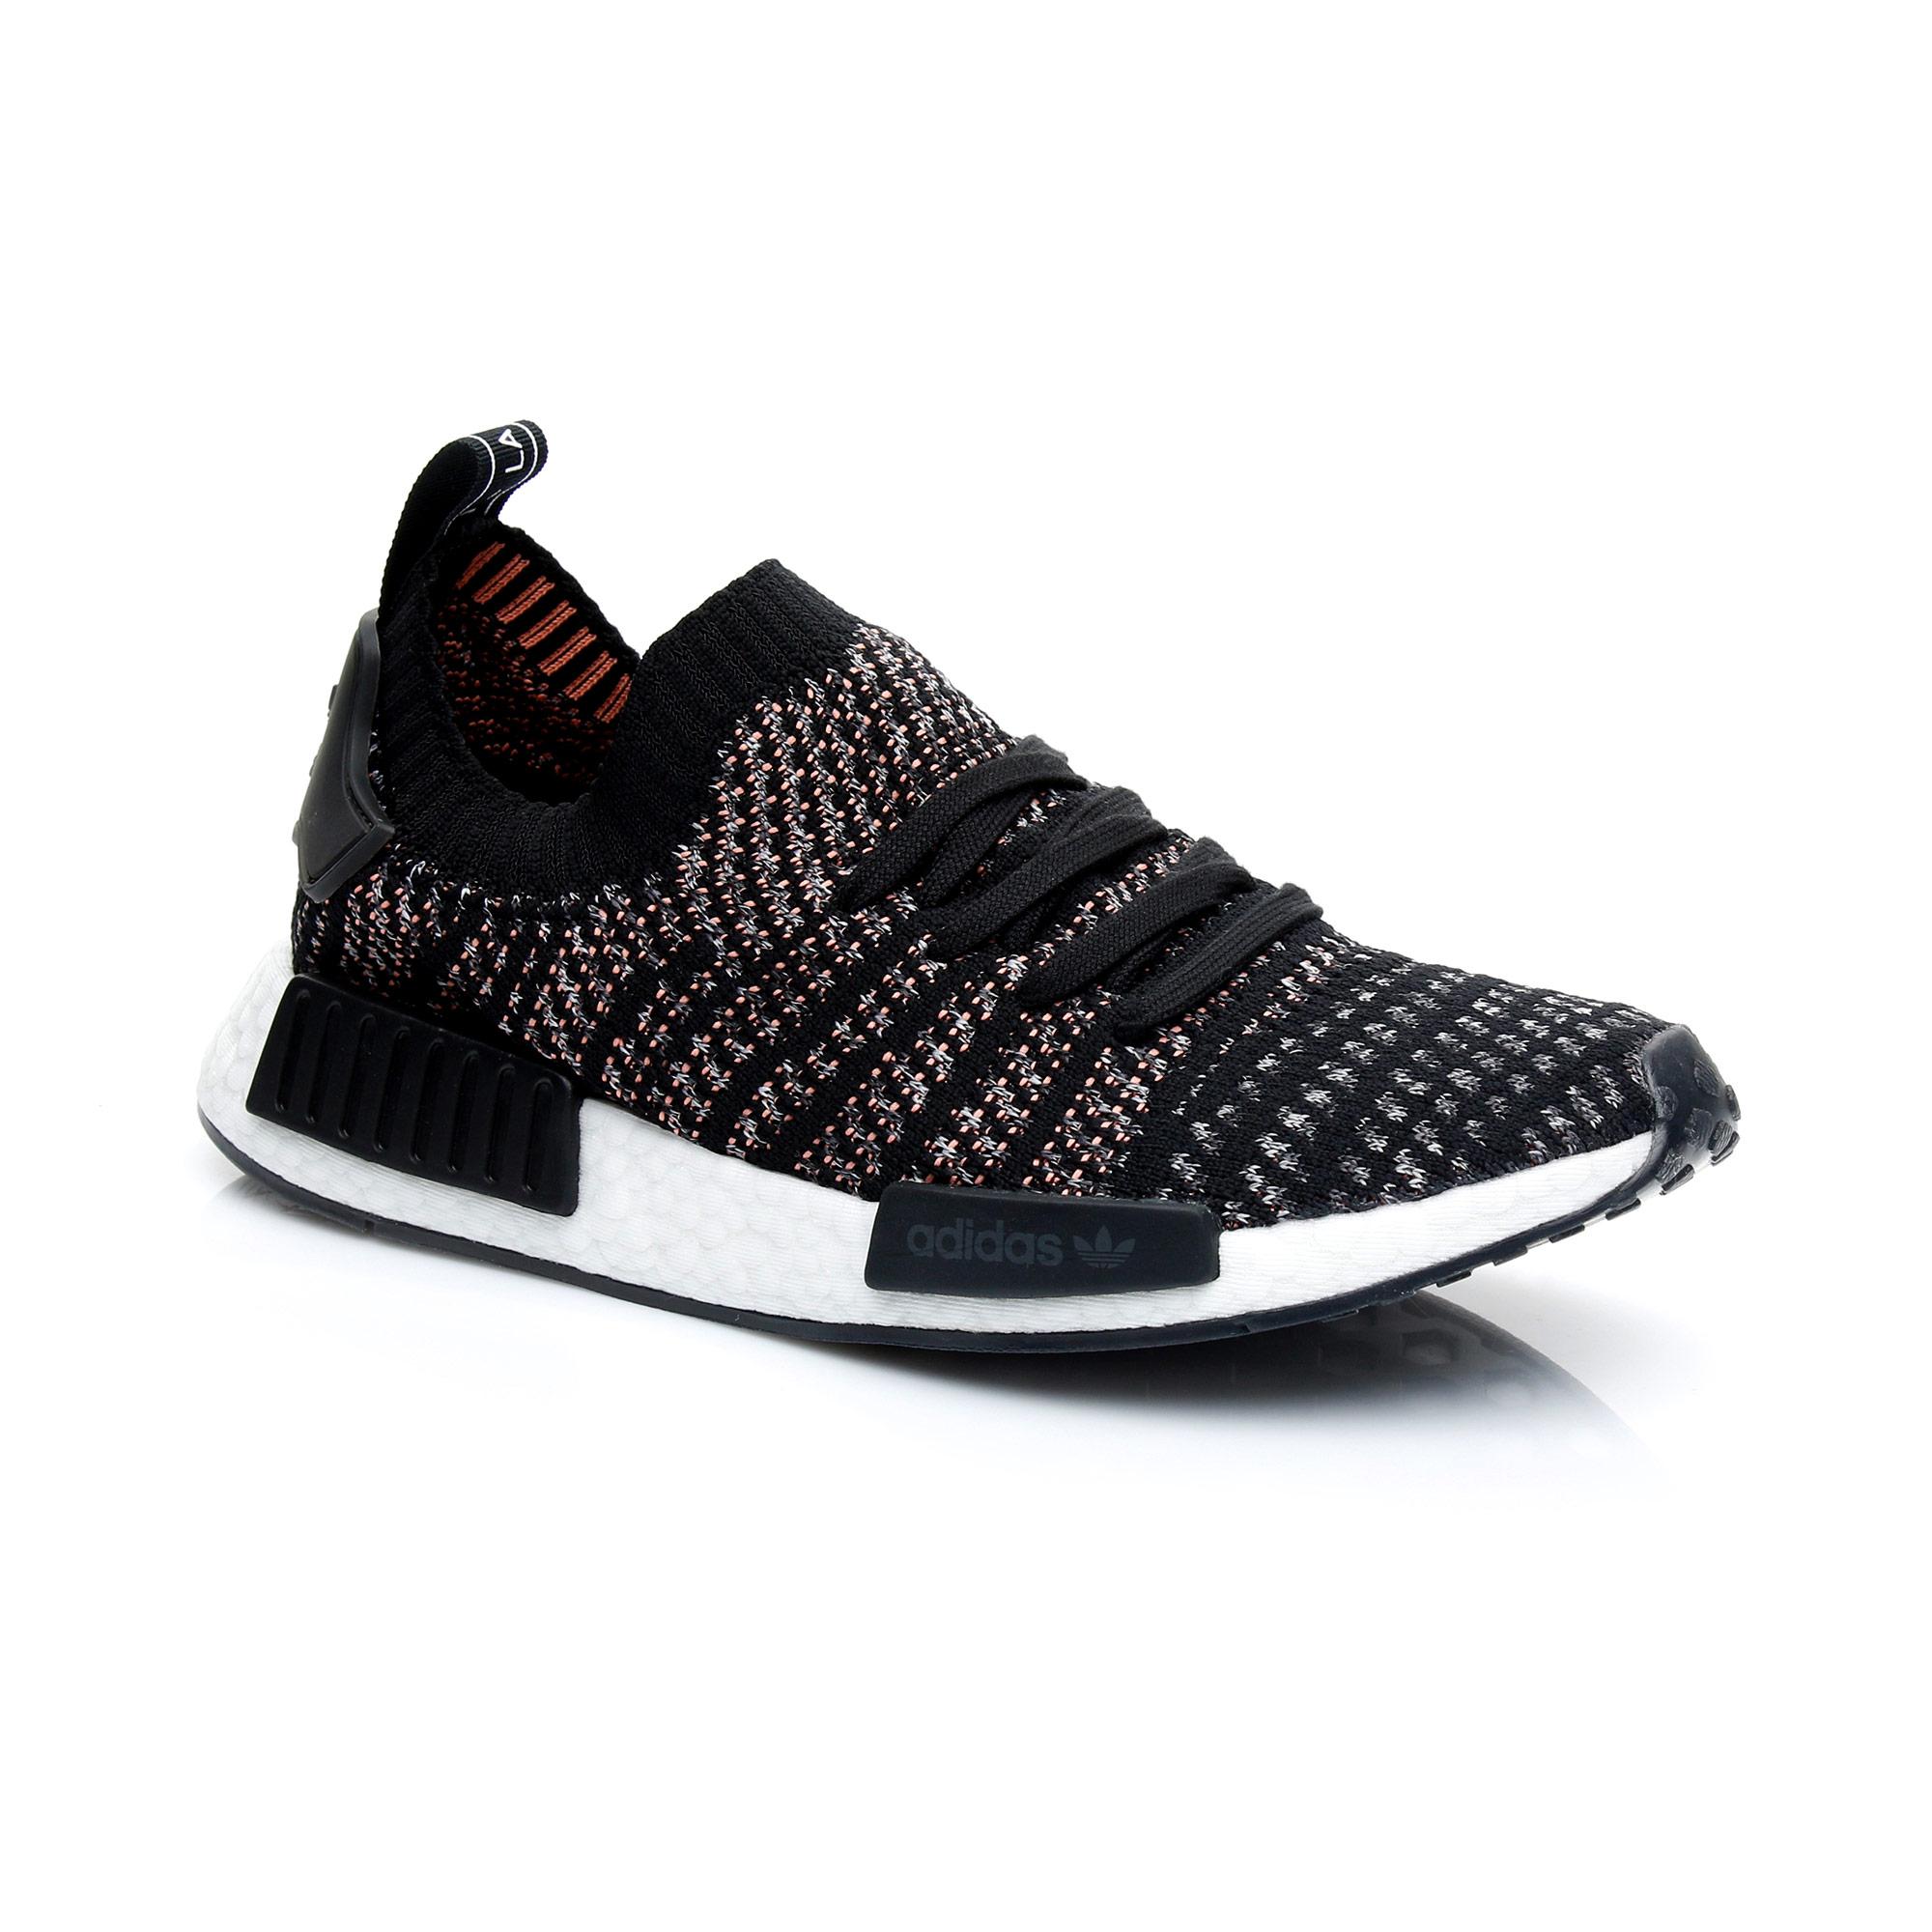 adidas NMD R1 Erkek Siyah Spor Ayakkabı